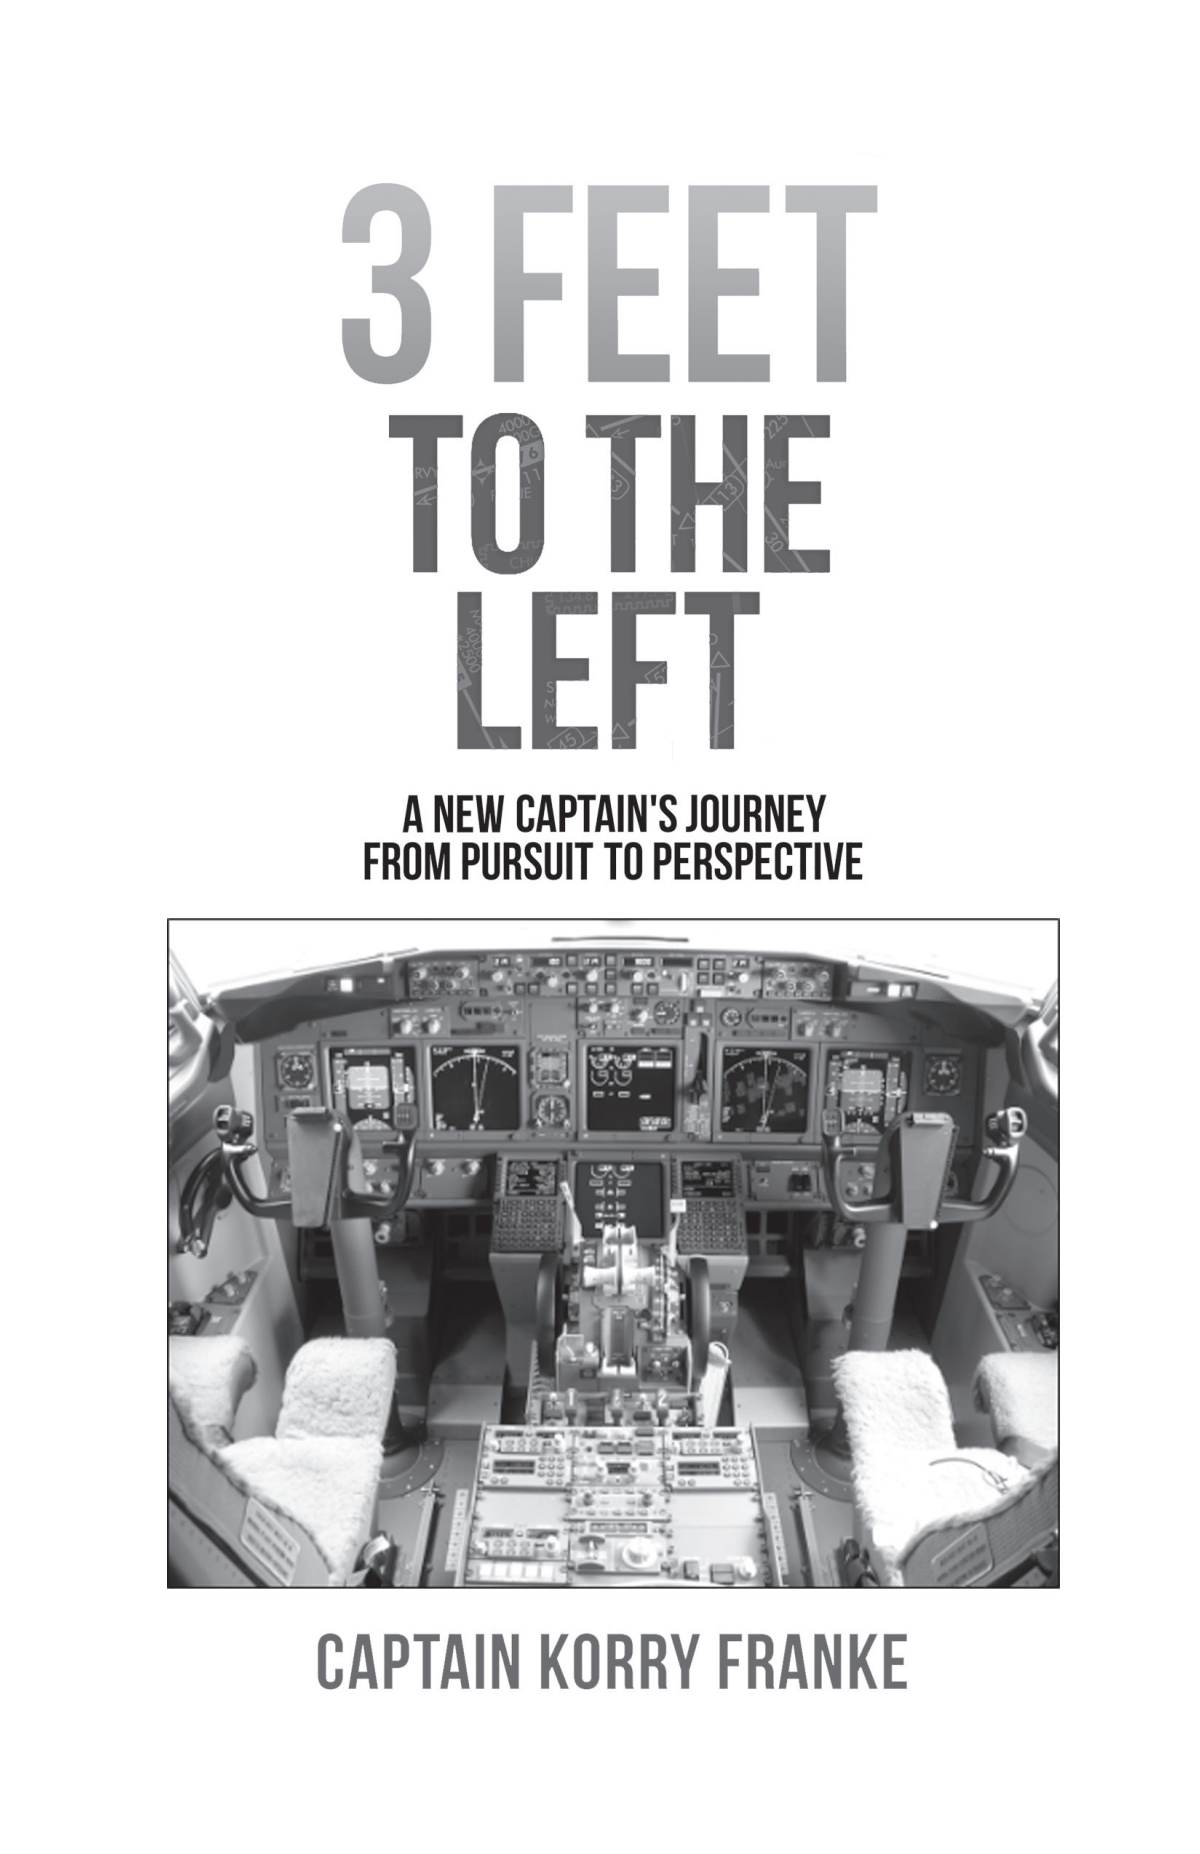 Interior layout and design for pilot's memoir